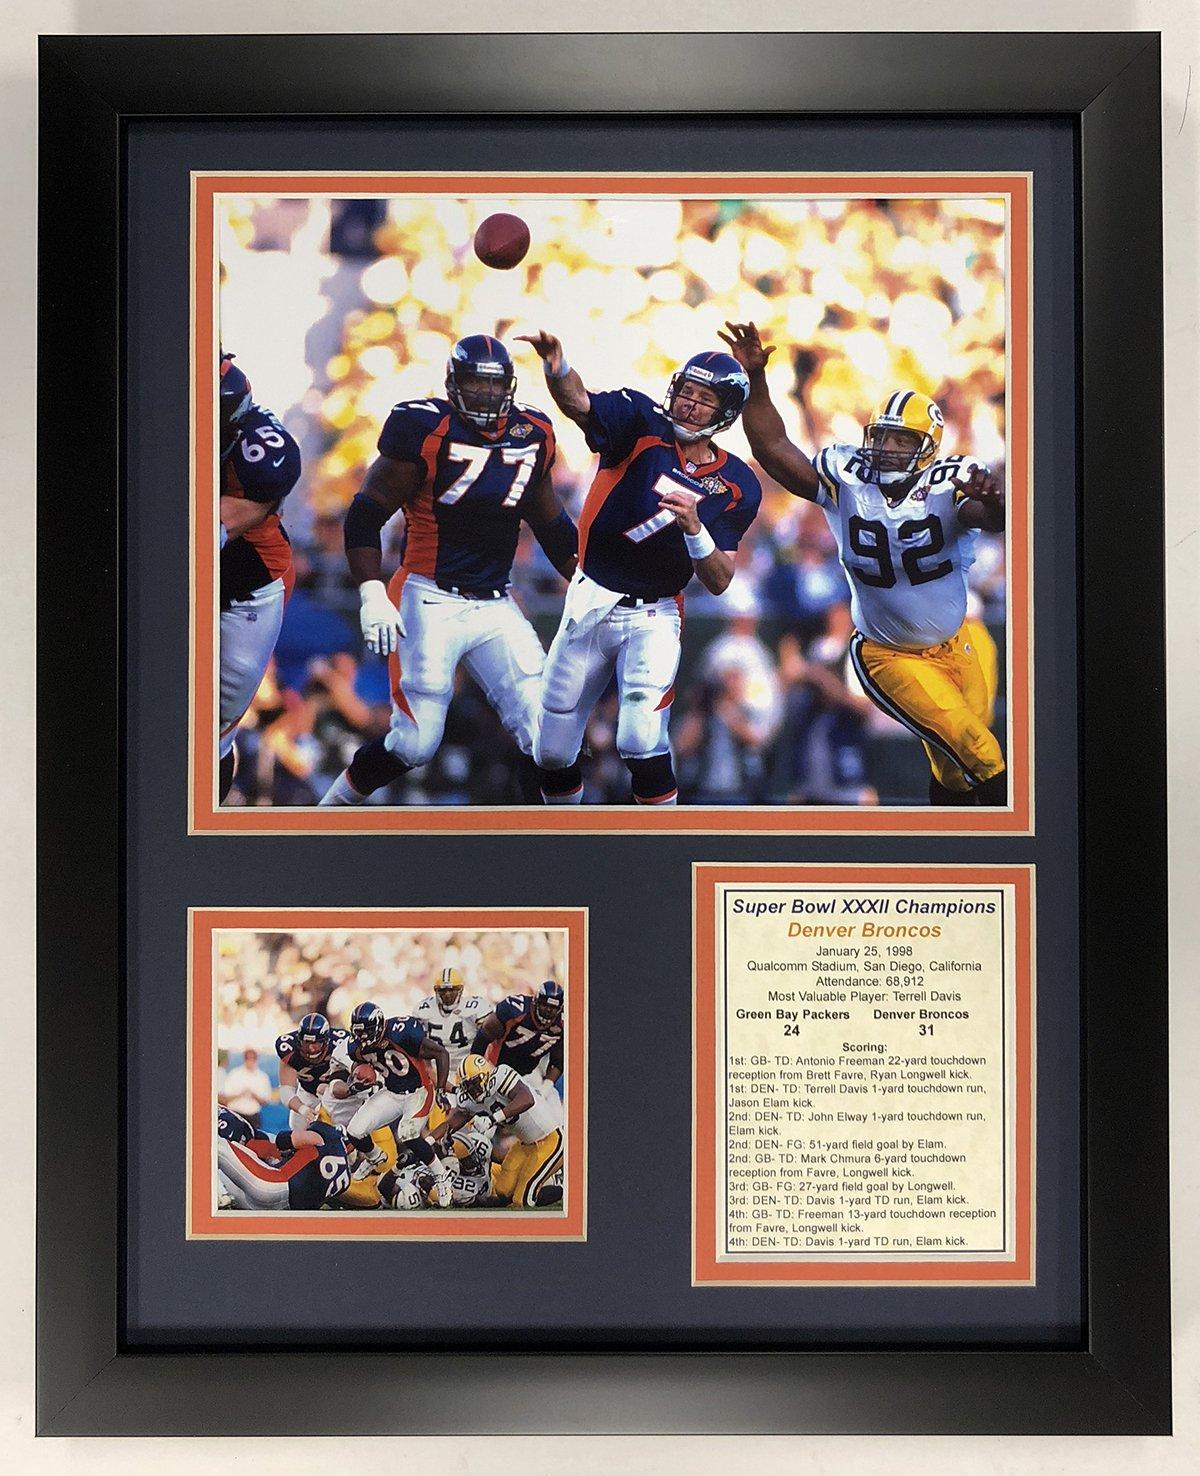 Legends Never Die NFL 1997 Denver Broncos Super Bowl XXXII Champions Framed Double Matted Photos, 12' x 15'